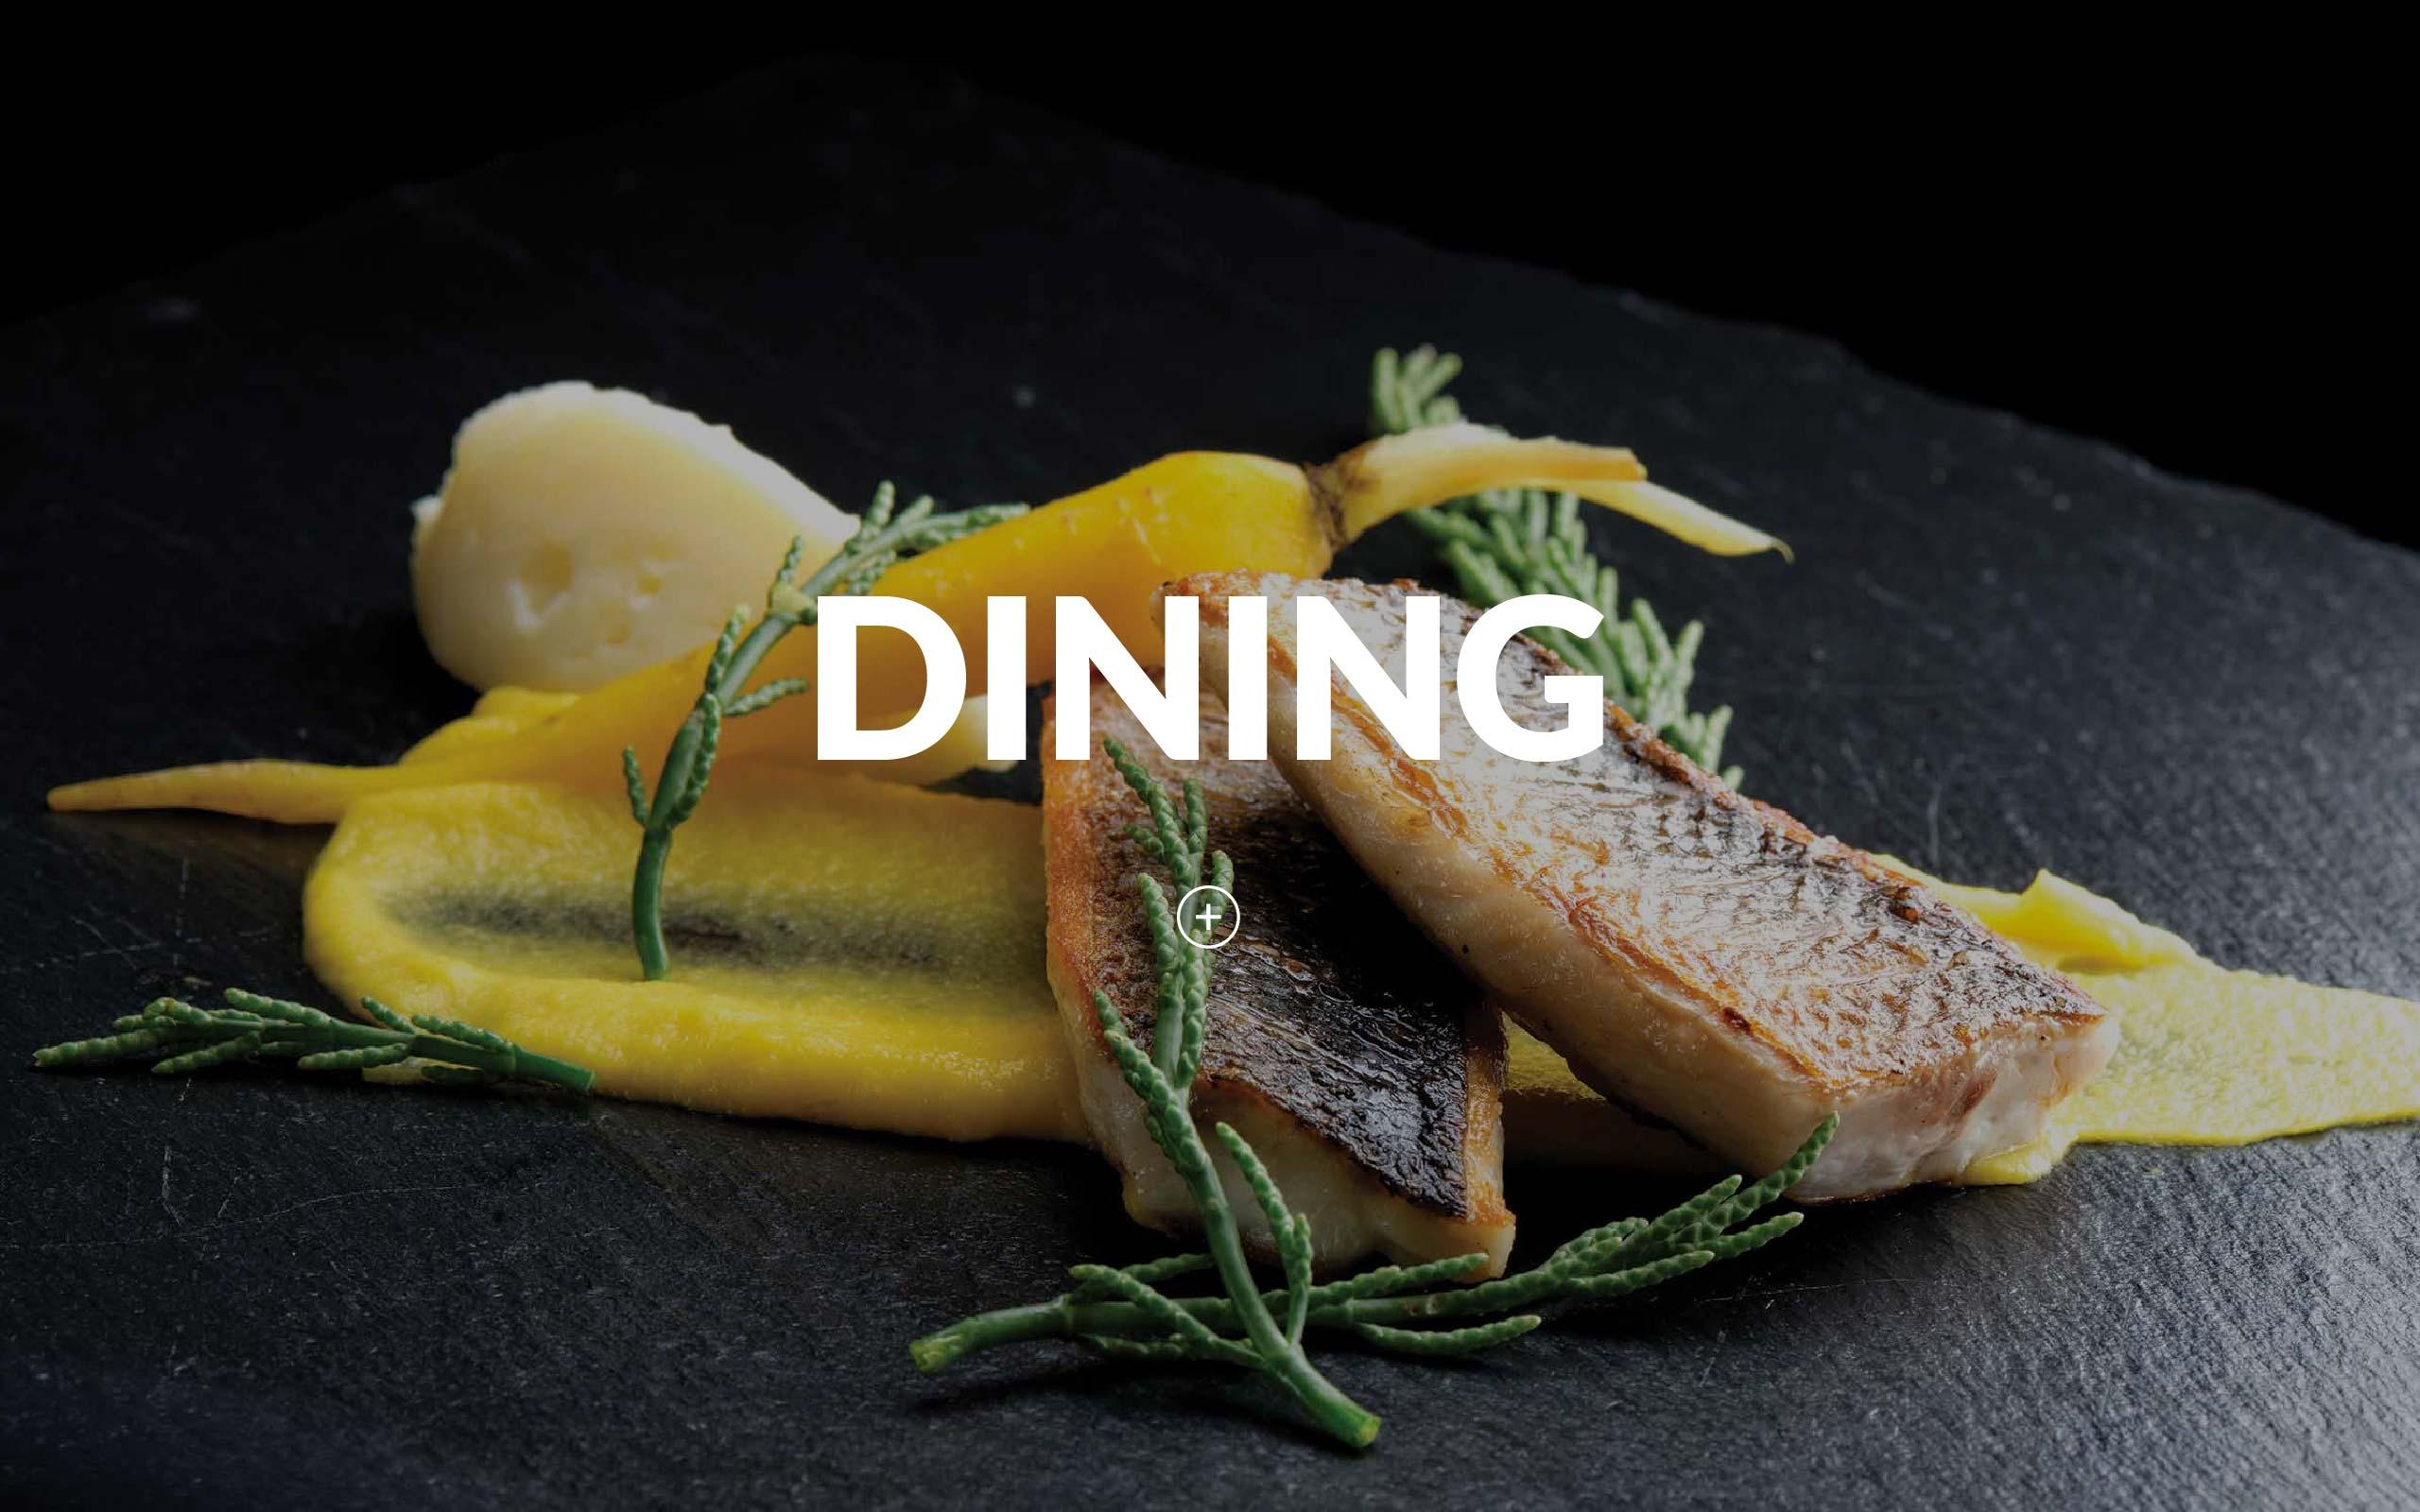 Lifestyle, Dining, Food, Lifestyle Malaysia